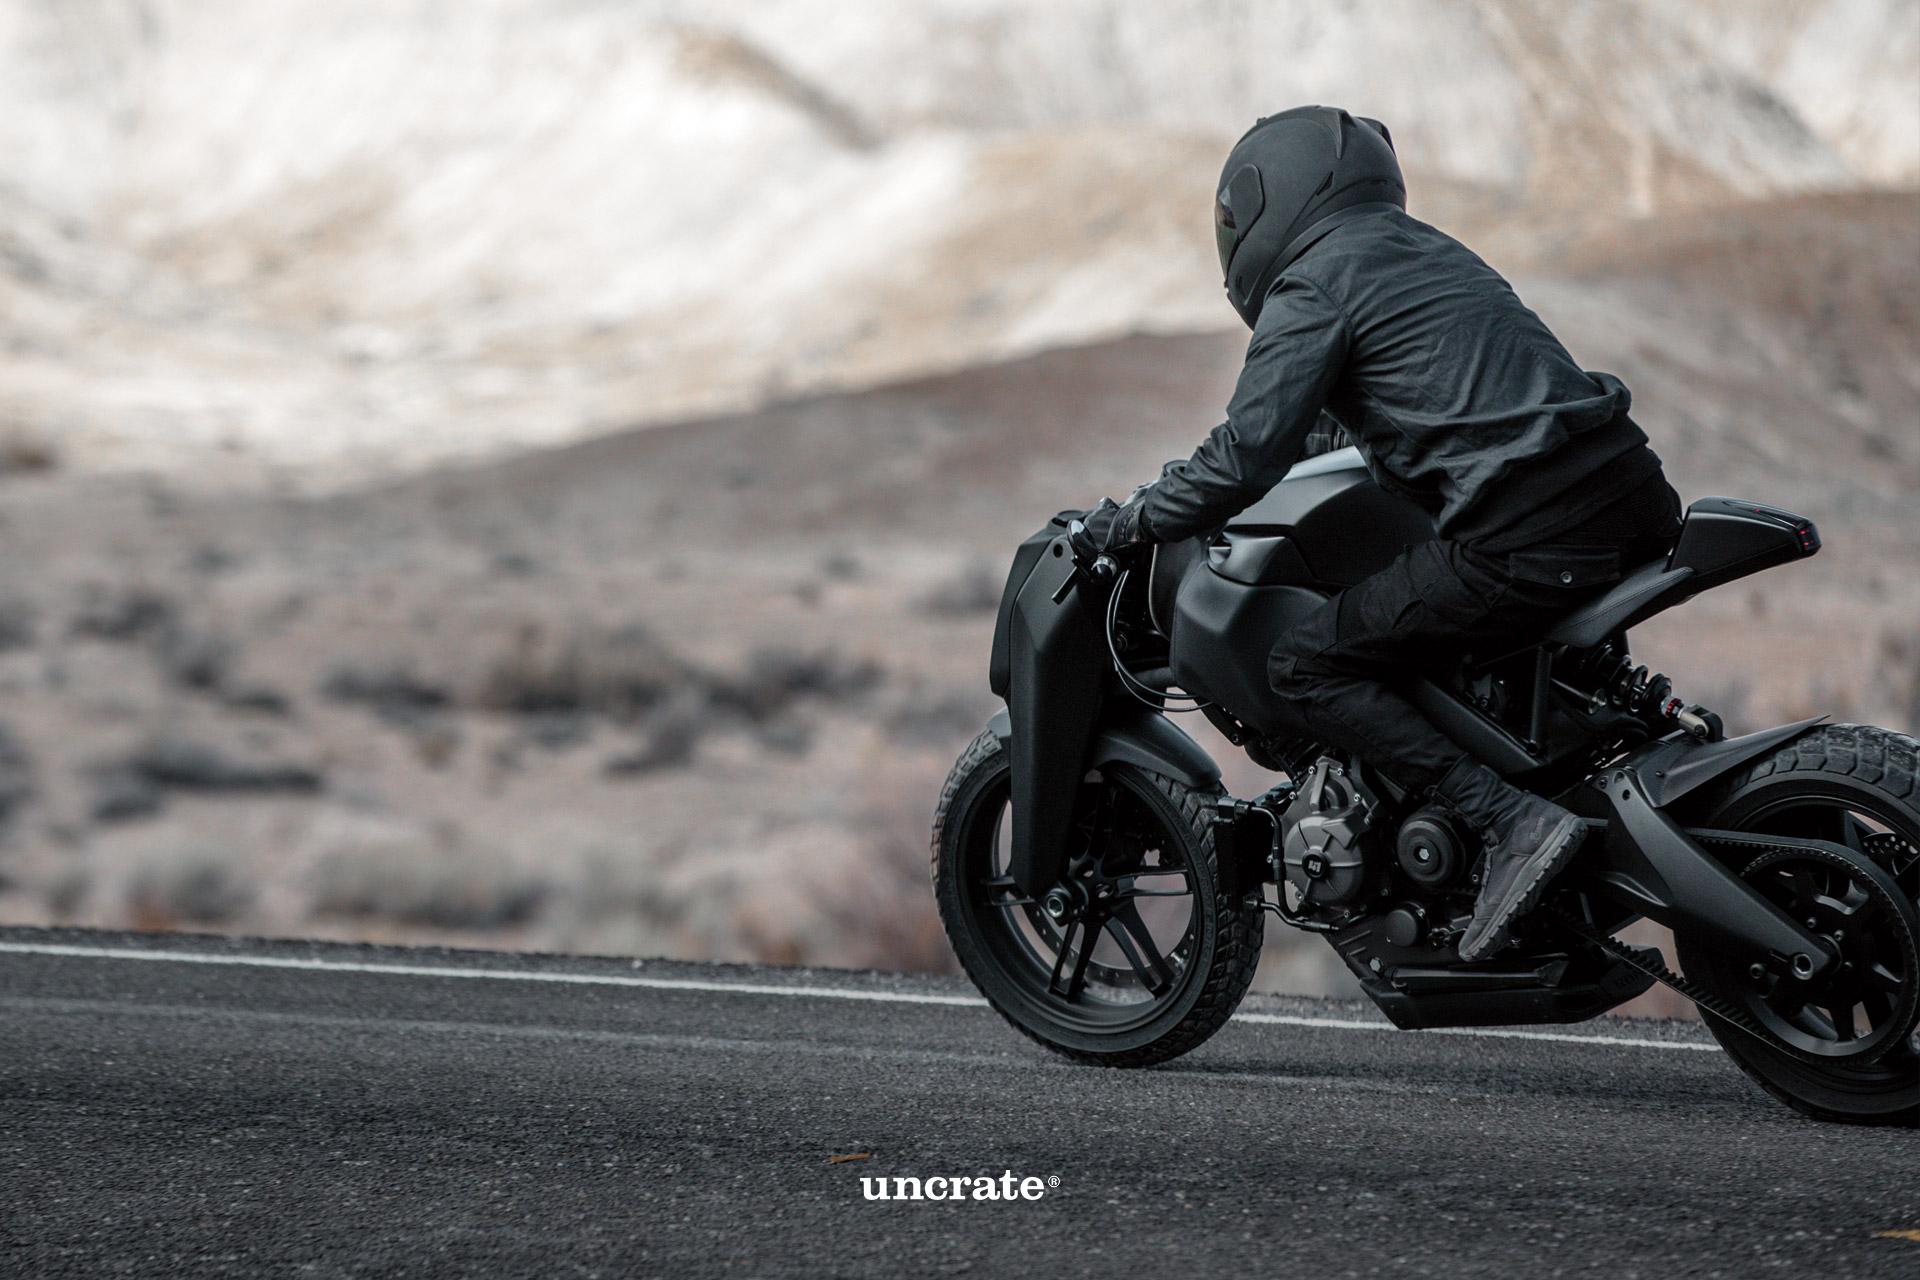 Ronin x Uncrate Motorcycles